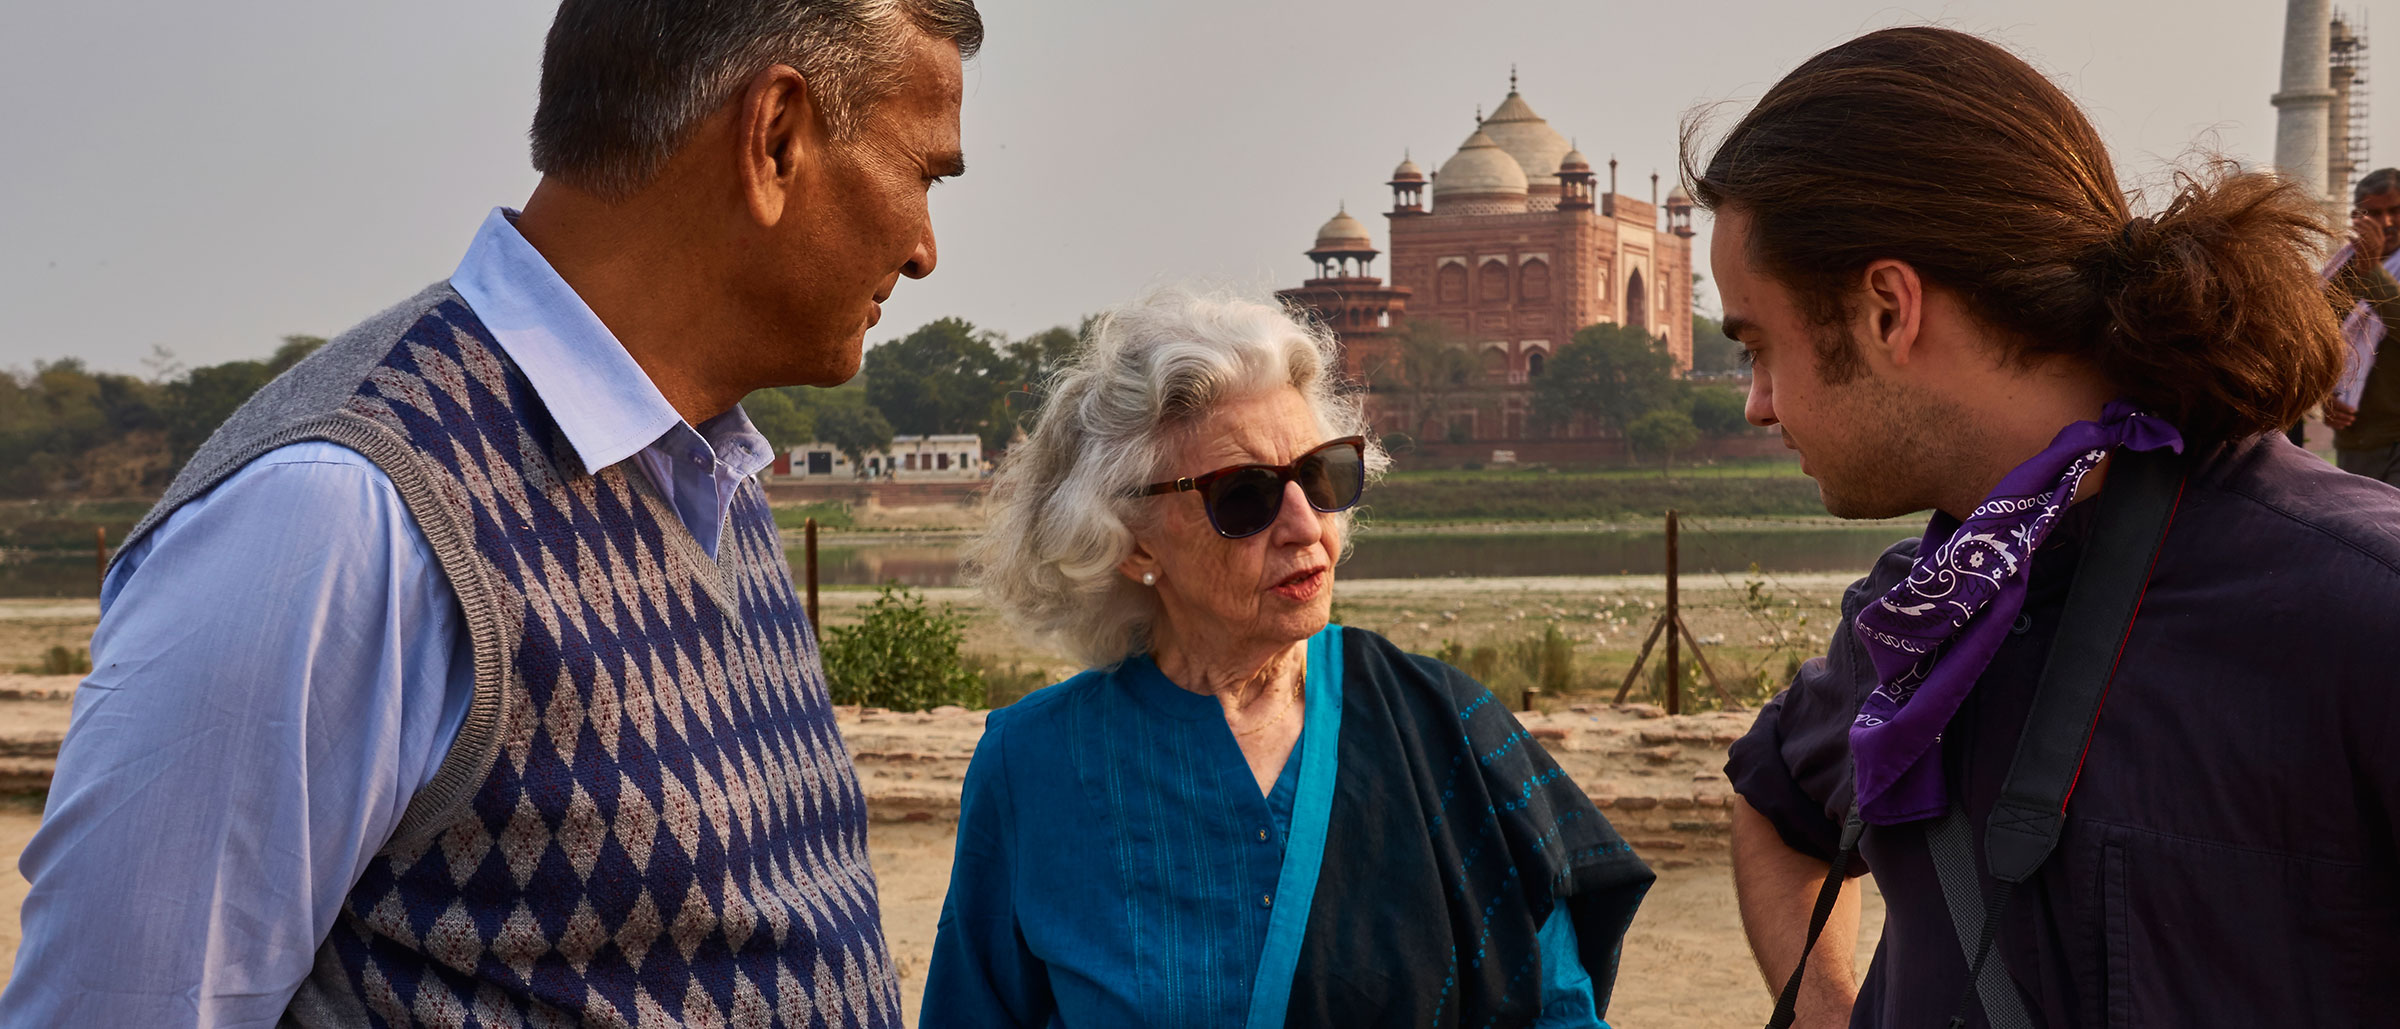 Elizabeth Moynihan wearing sunglasses in India